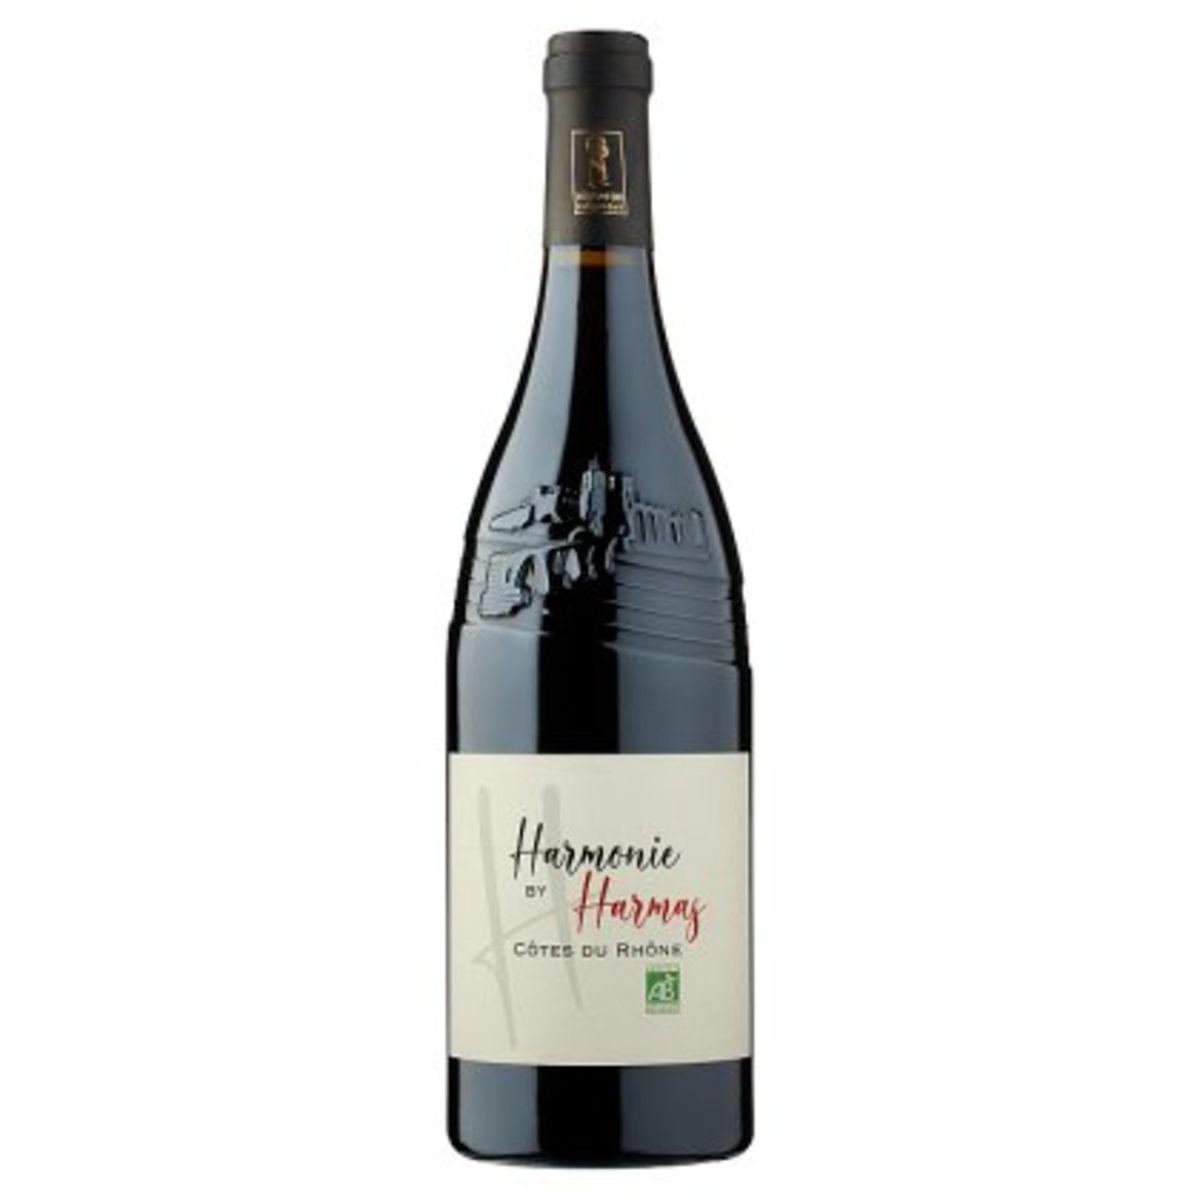 Harmonie By Harmas Côtes du Rhône 750 ml